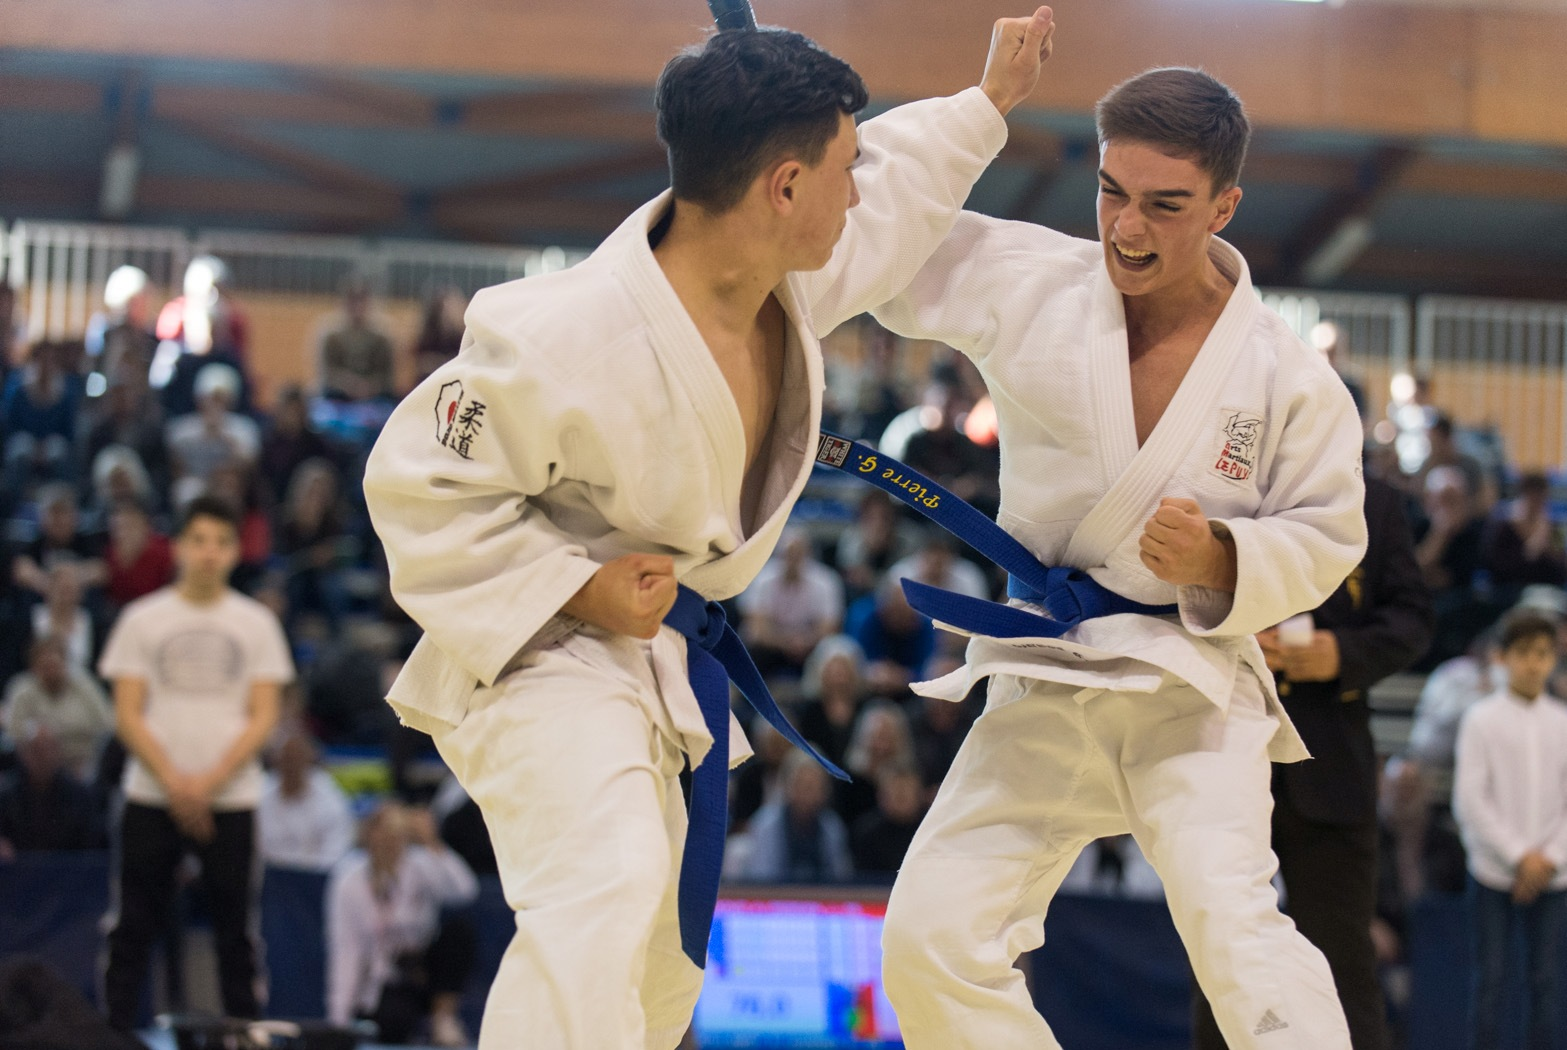 Rémi Boulamoy / Pierre Guinant champions de France Jujitsu